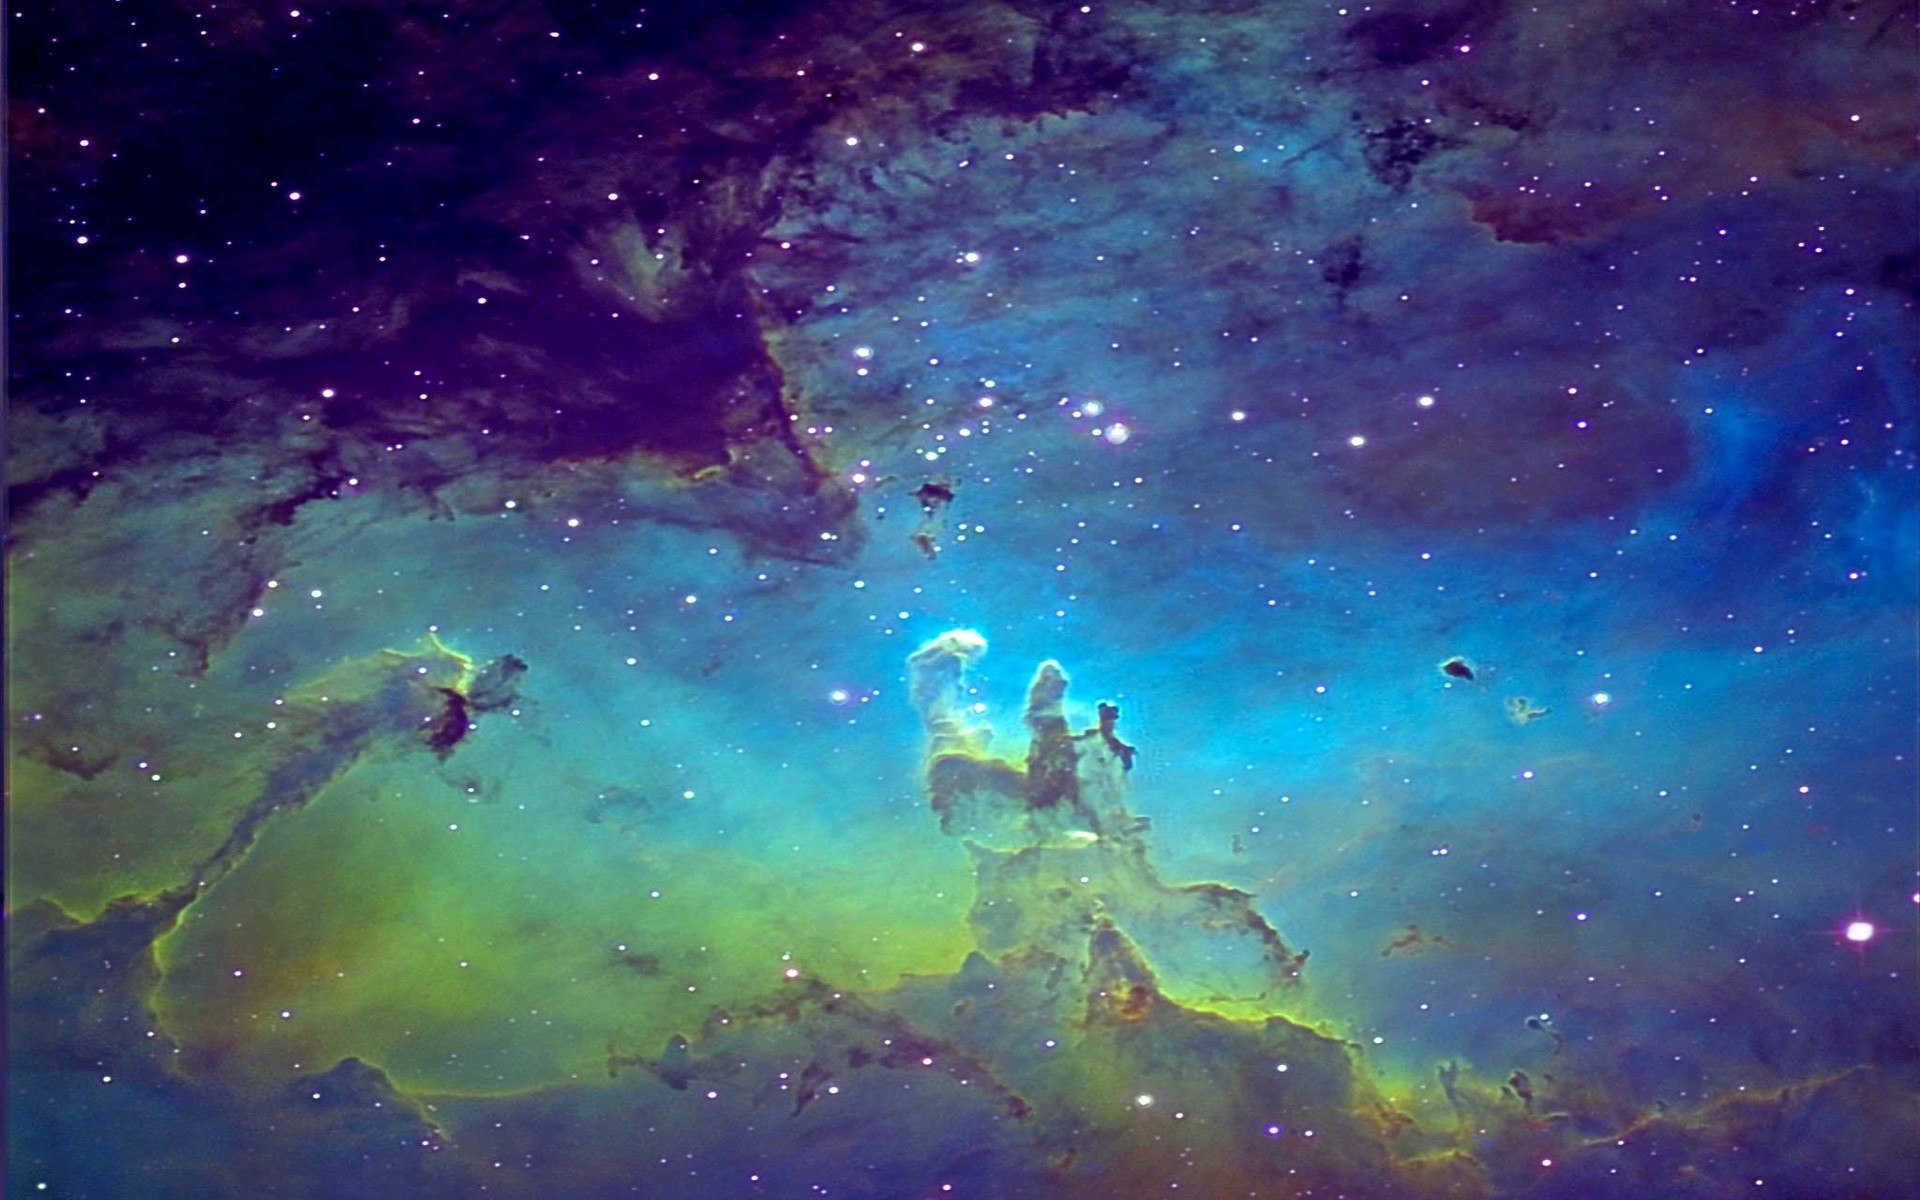 … galaxy wallpaper tumblr wallpapercraft …